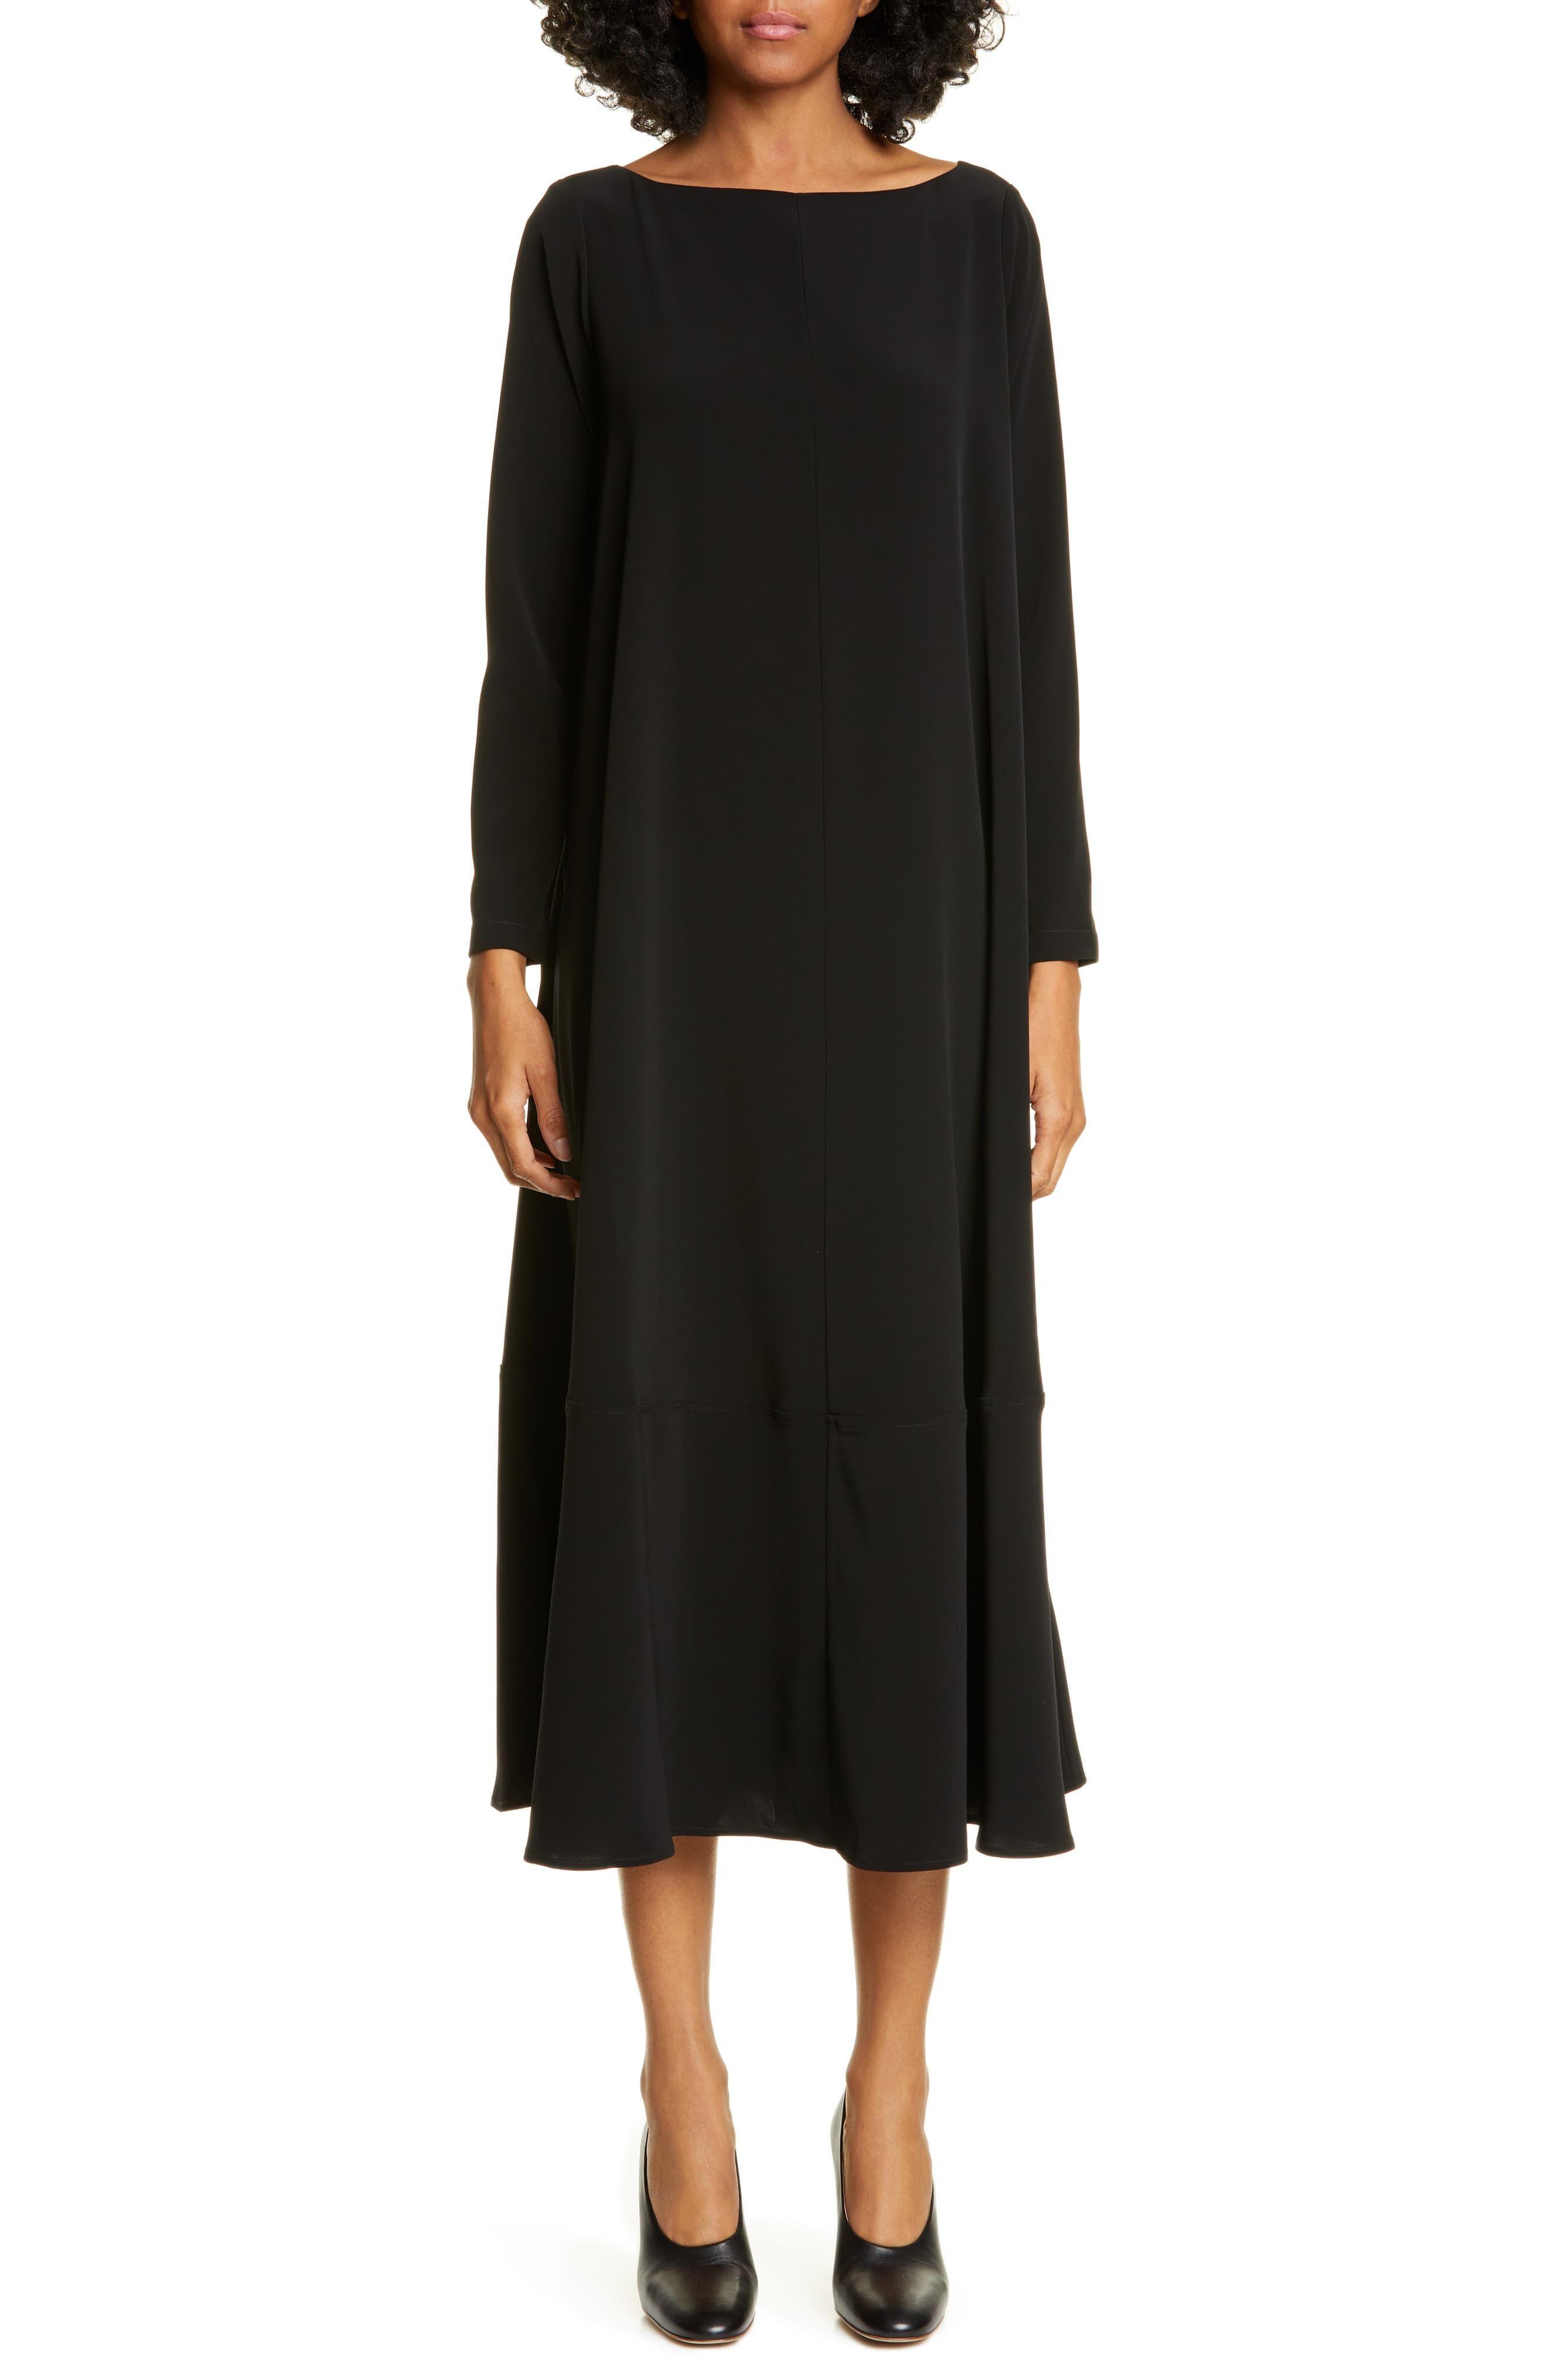 Women S Co Bateau Neck Long Sleeve Midi Dress Size Small Black In 2021 Long Sleeve Midi Black Dress With Sleeves Long Sleeve Midi Dress [ 4048 x 2640 Pixel ]